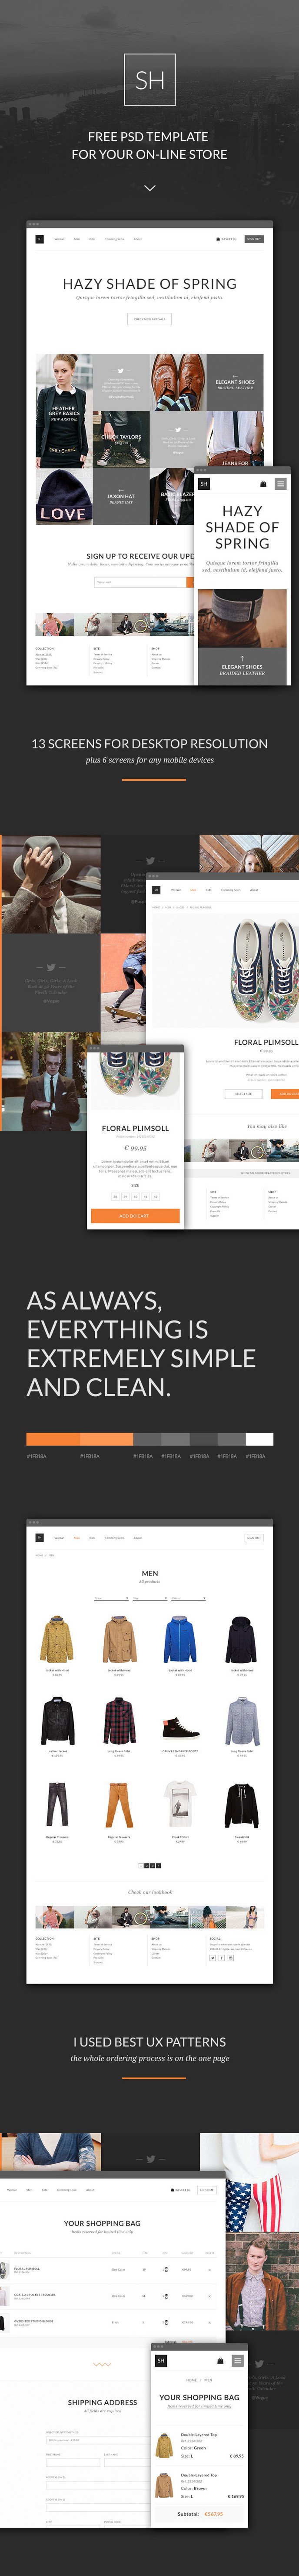 Free PSD e-Commerce Template